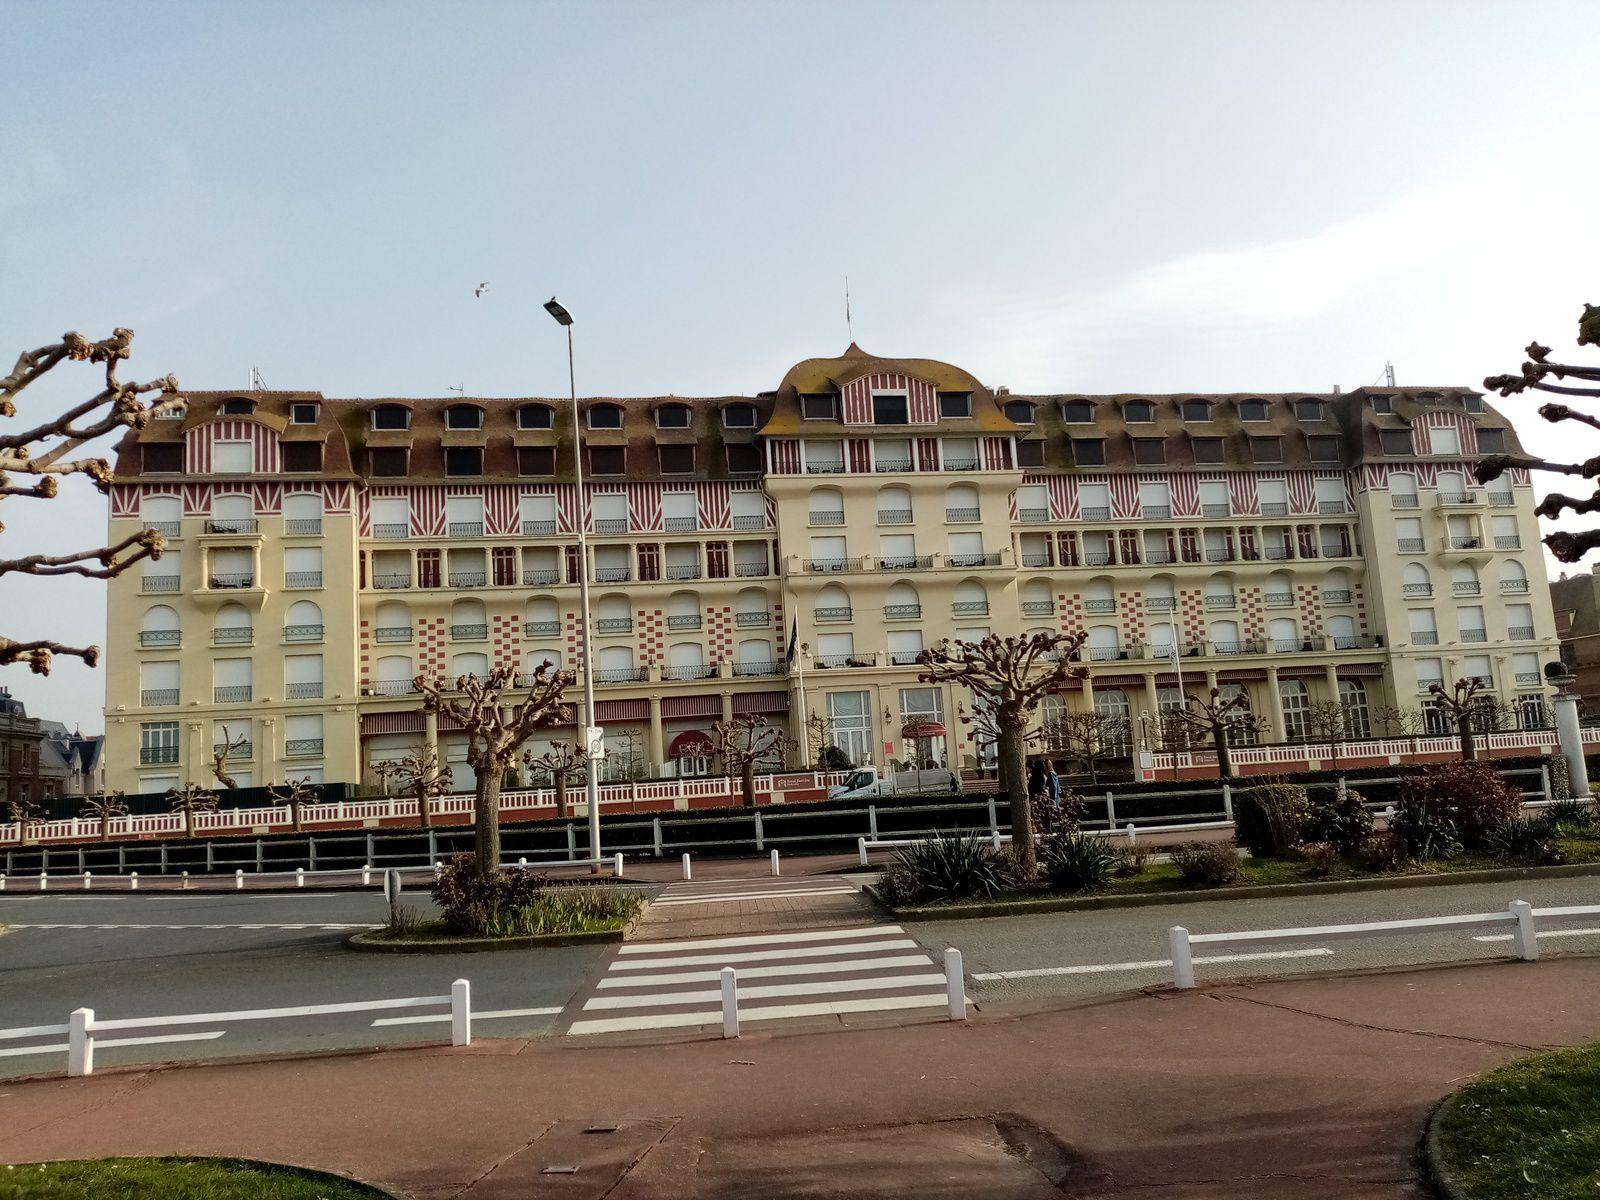 Coucou de Normandie (vacances)